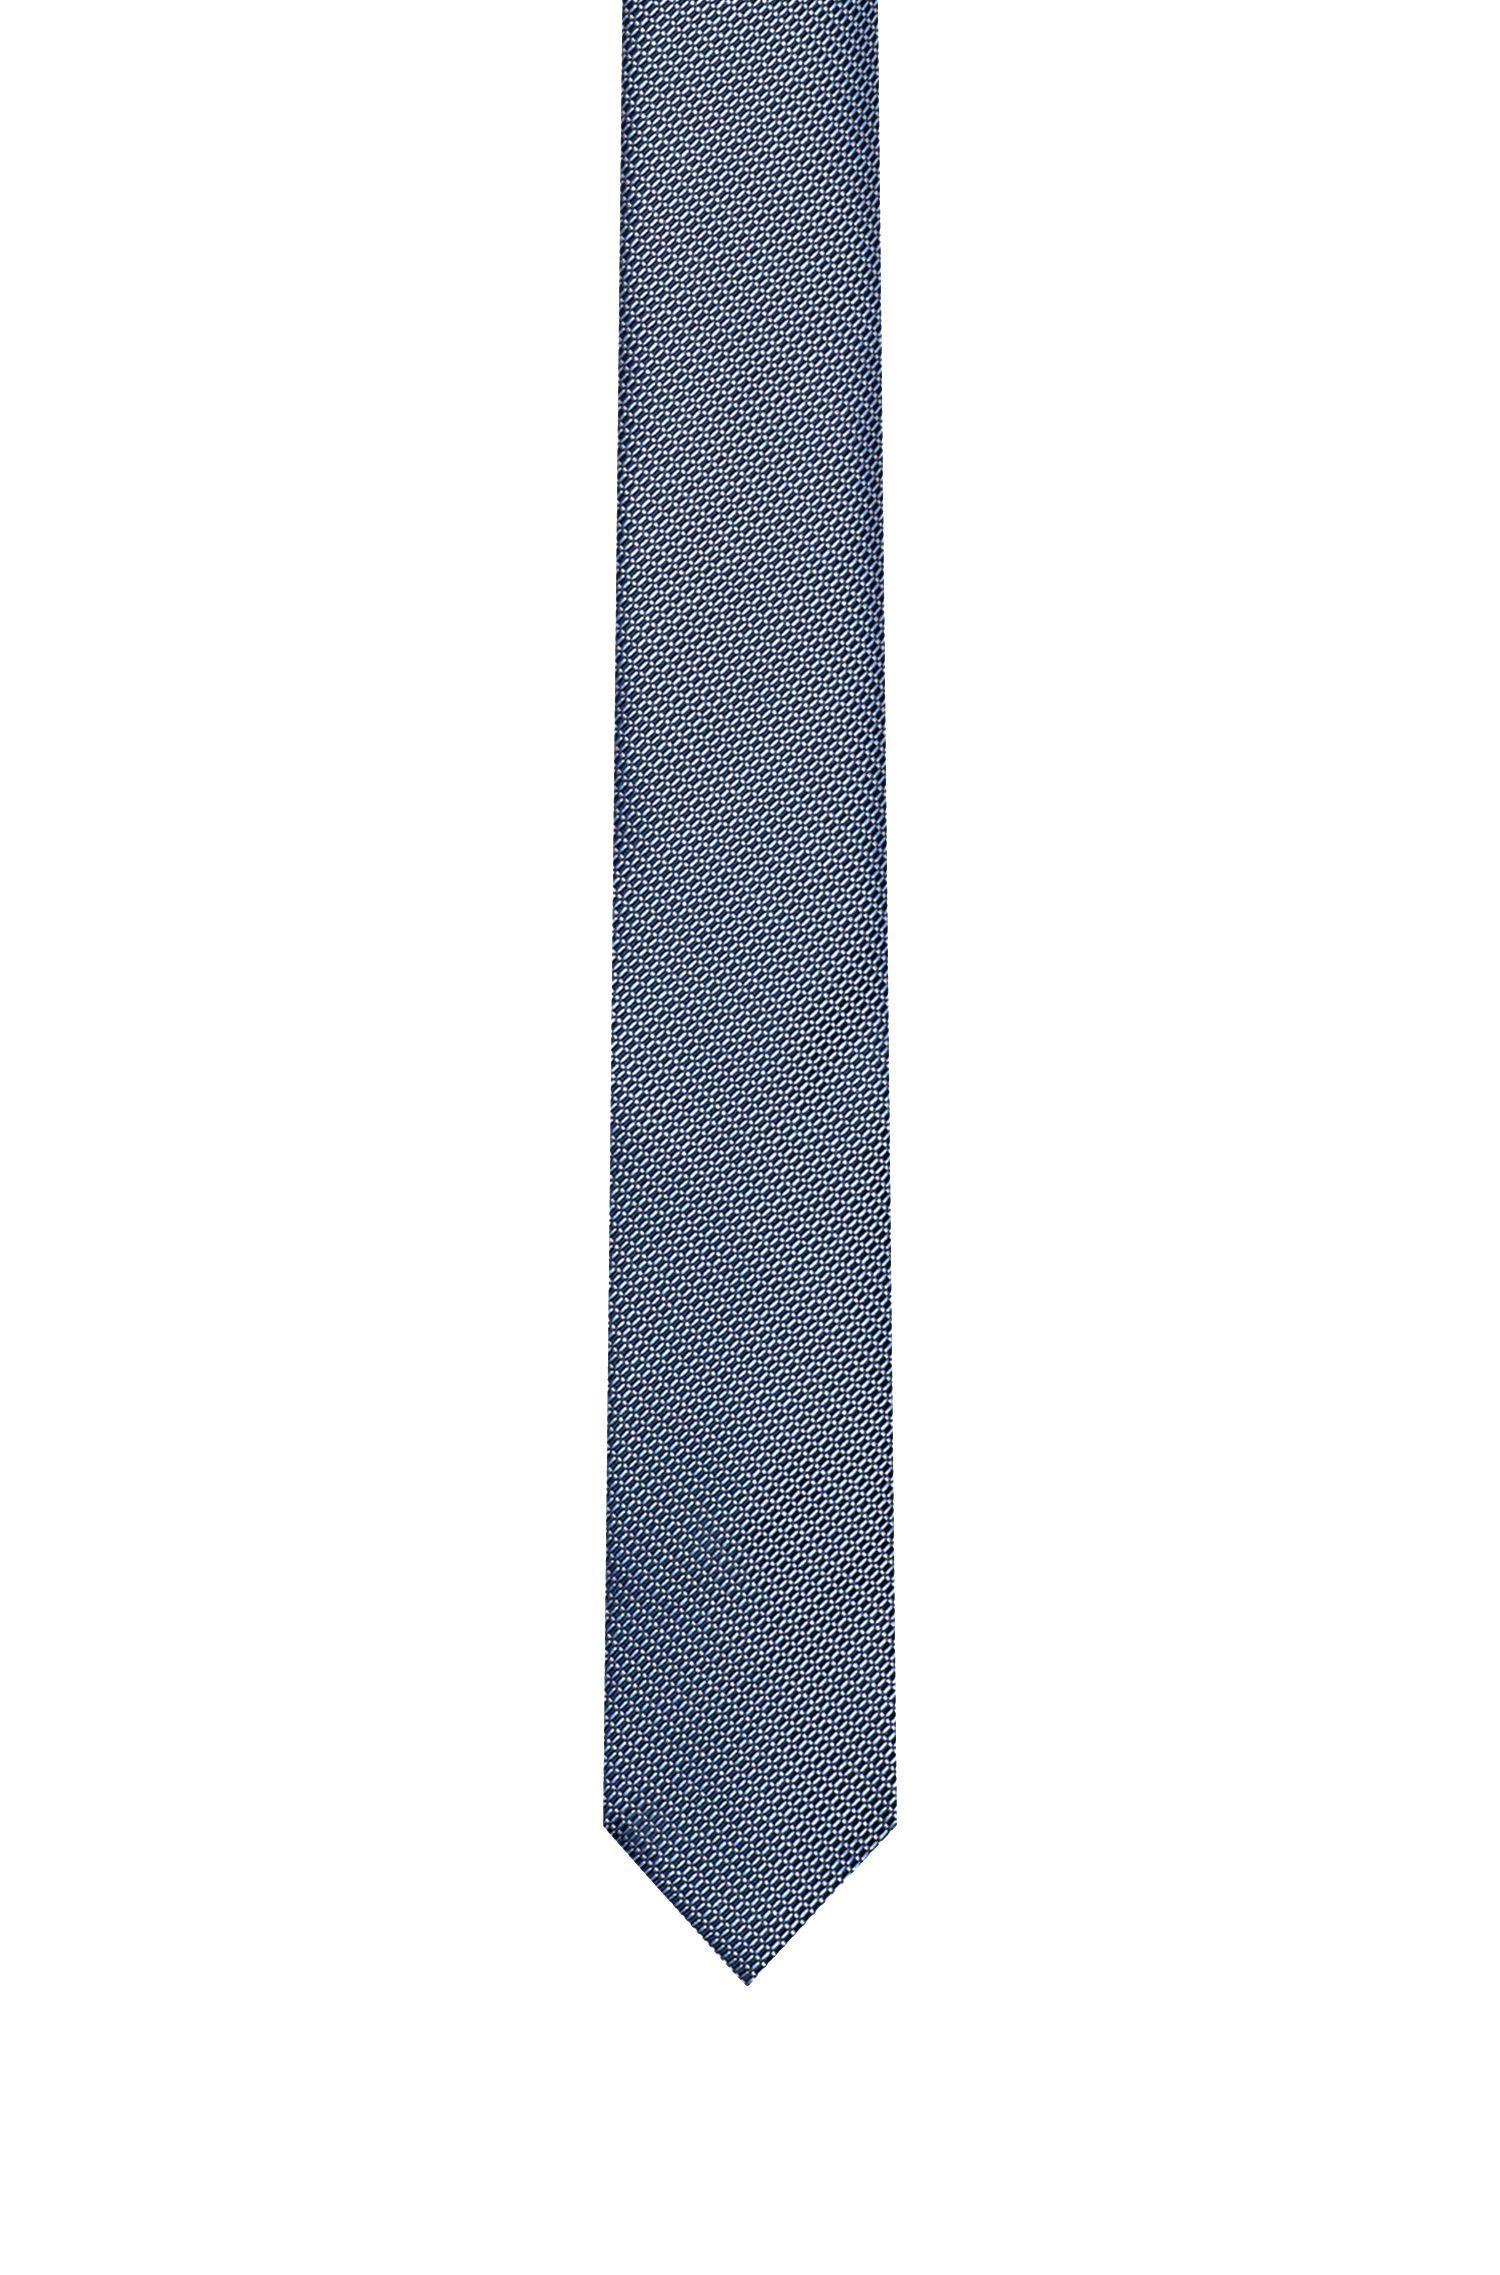 Fein gemusterte Krawatte aus Seide